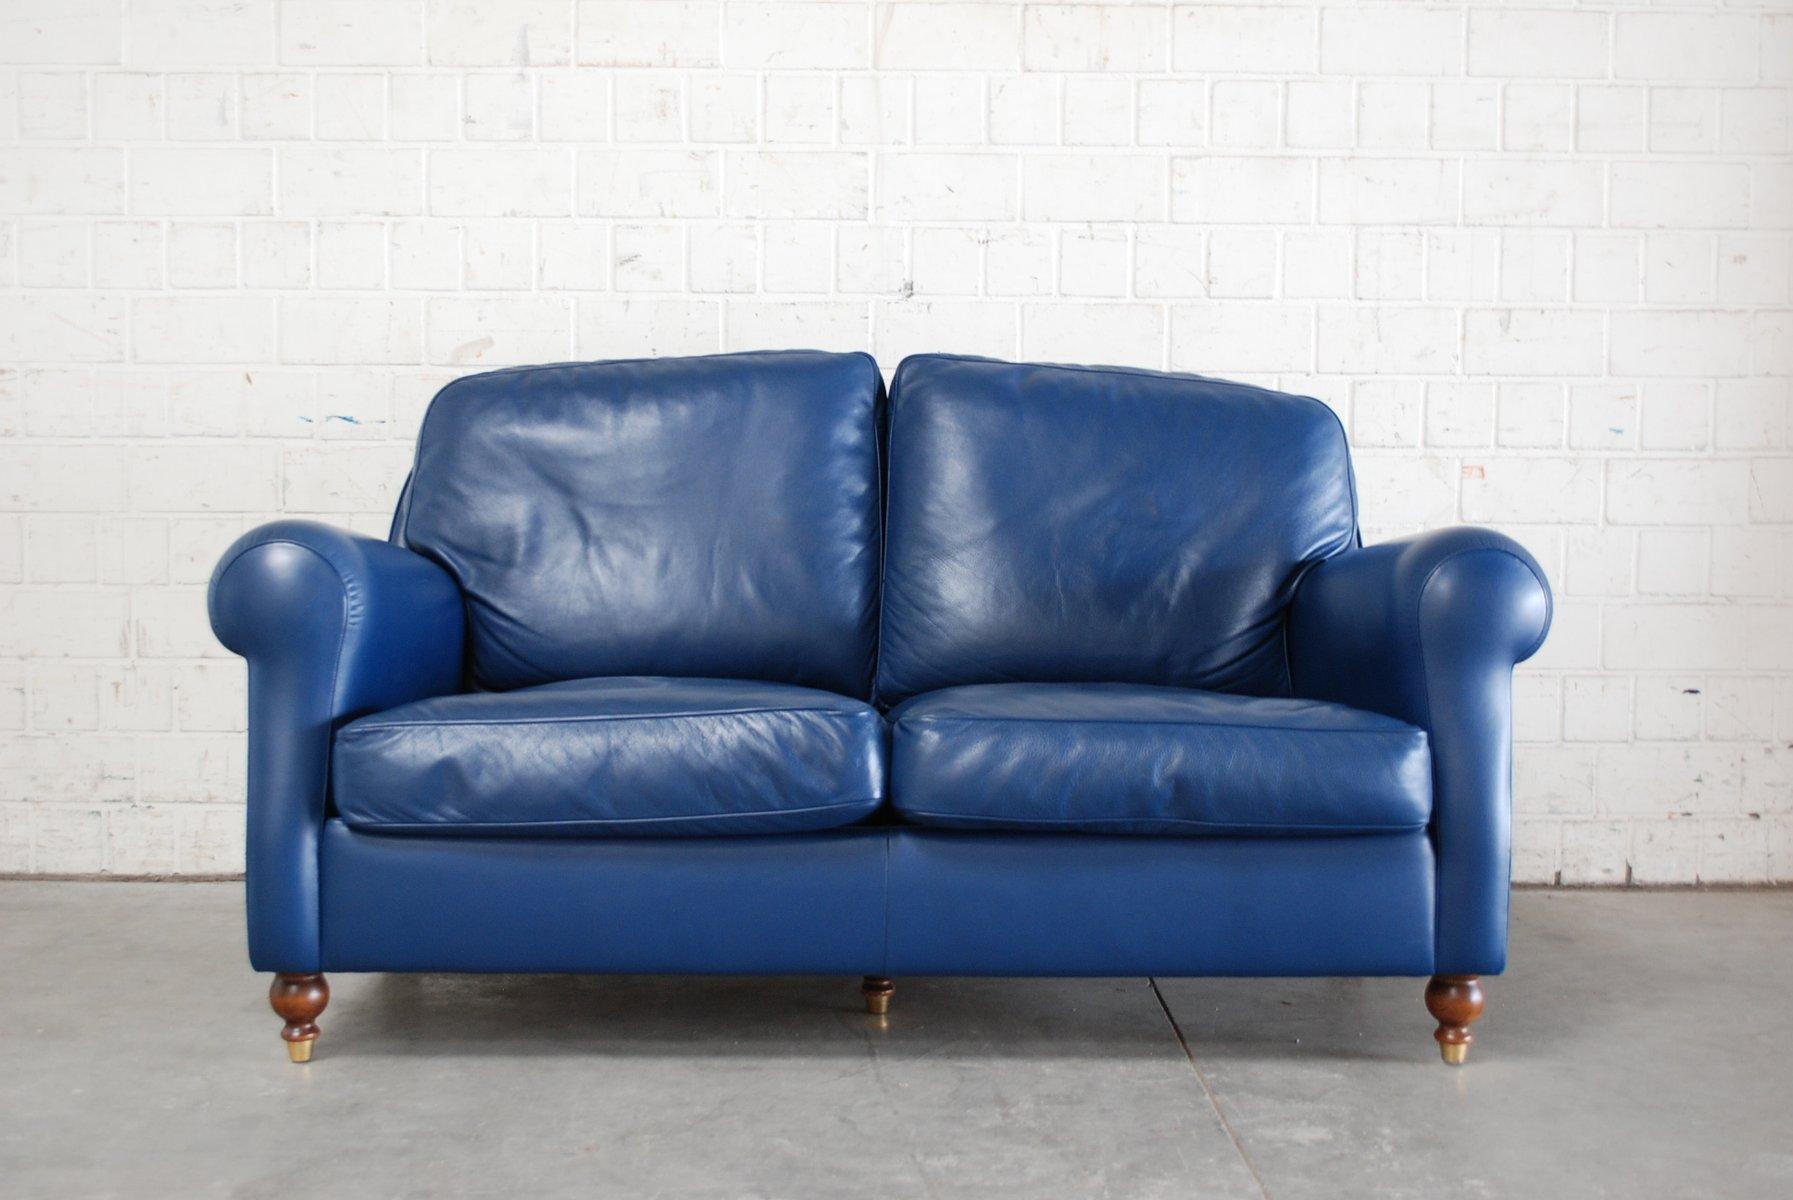 canap george en cuir bleu de poltrona frau 1999 en vente sur pamono. Black Bedroom Furniture Sets. Home Design Ideas